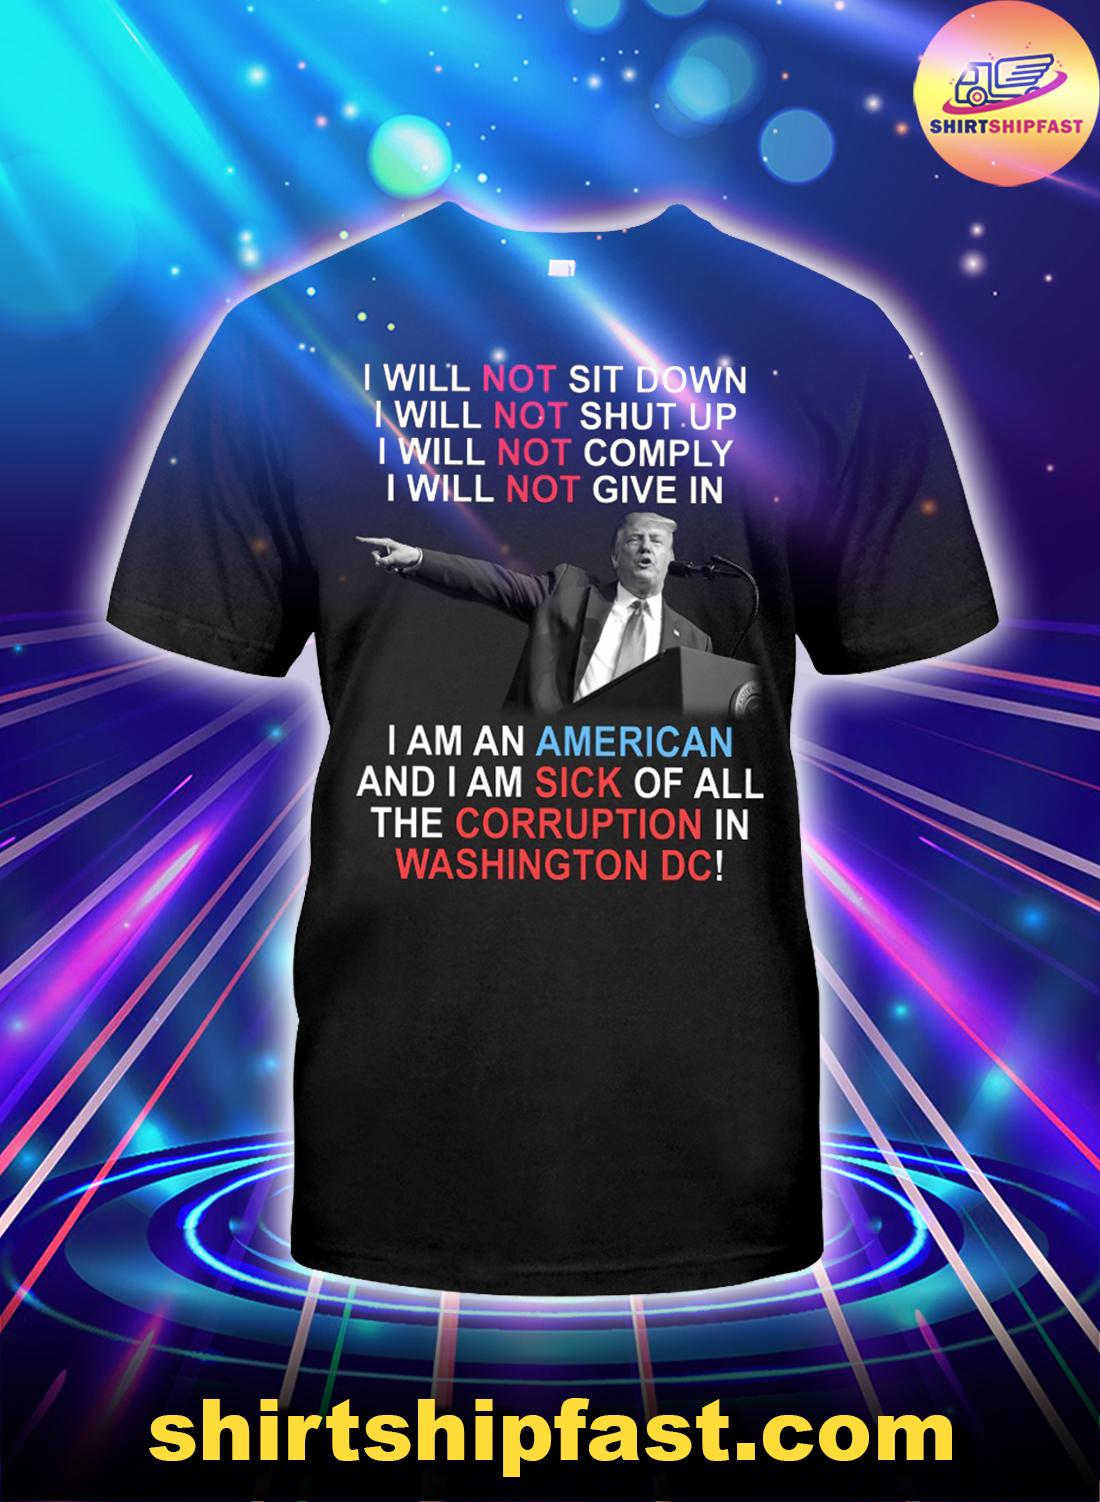 Trump-I-will-not-sit-down-I-will-not-shut-up-shirt